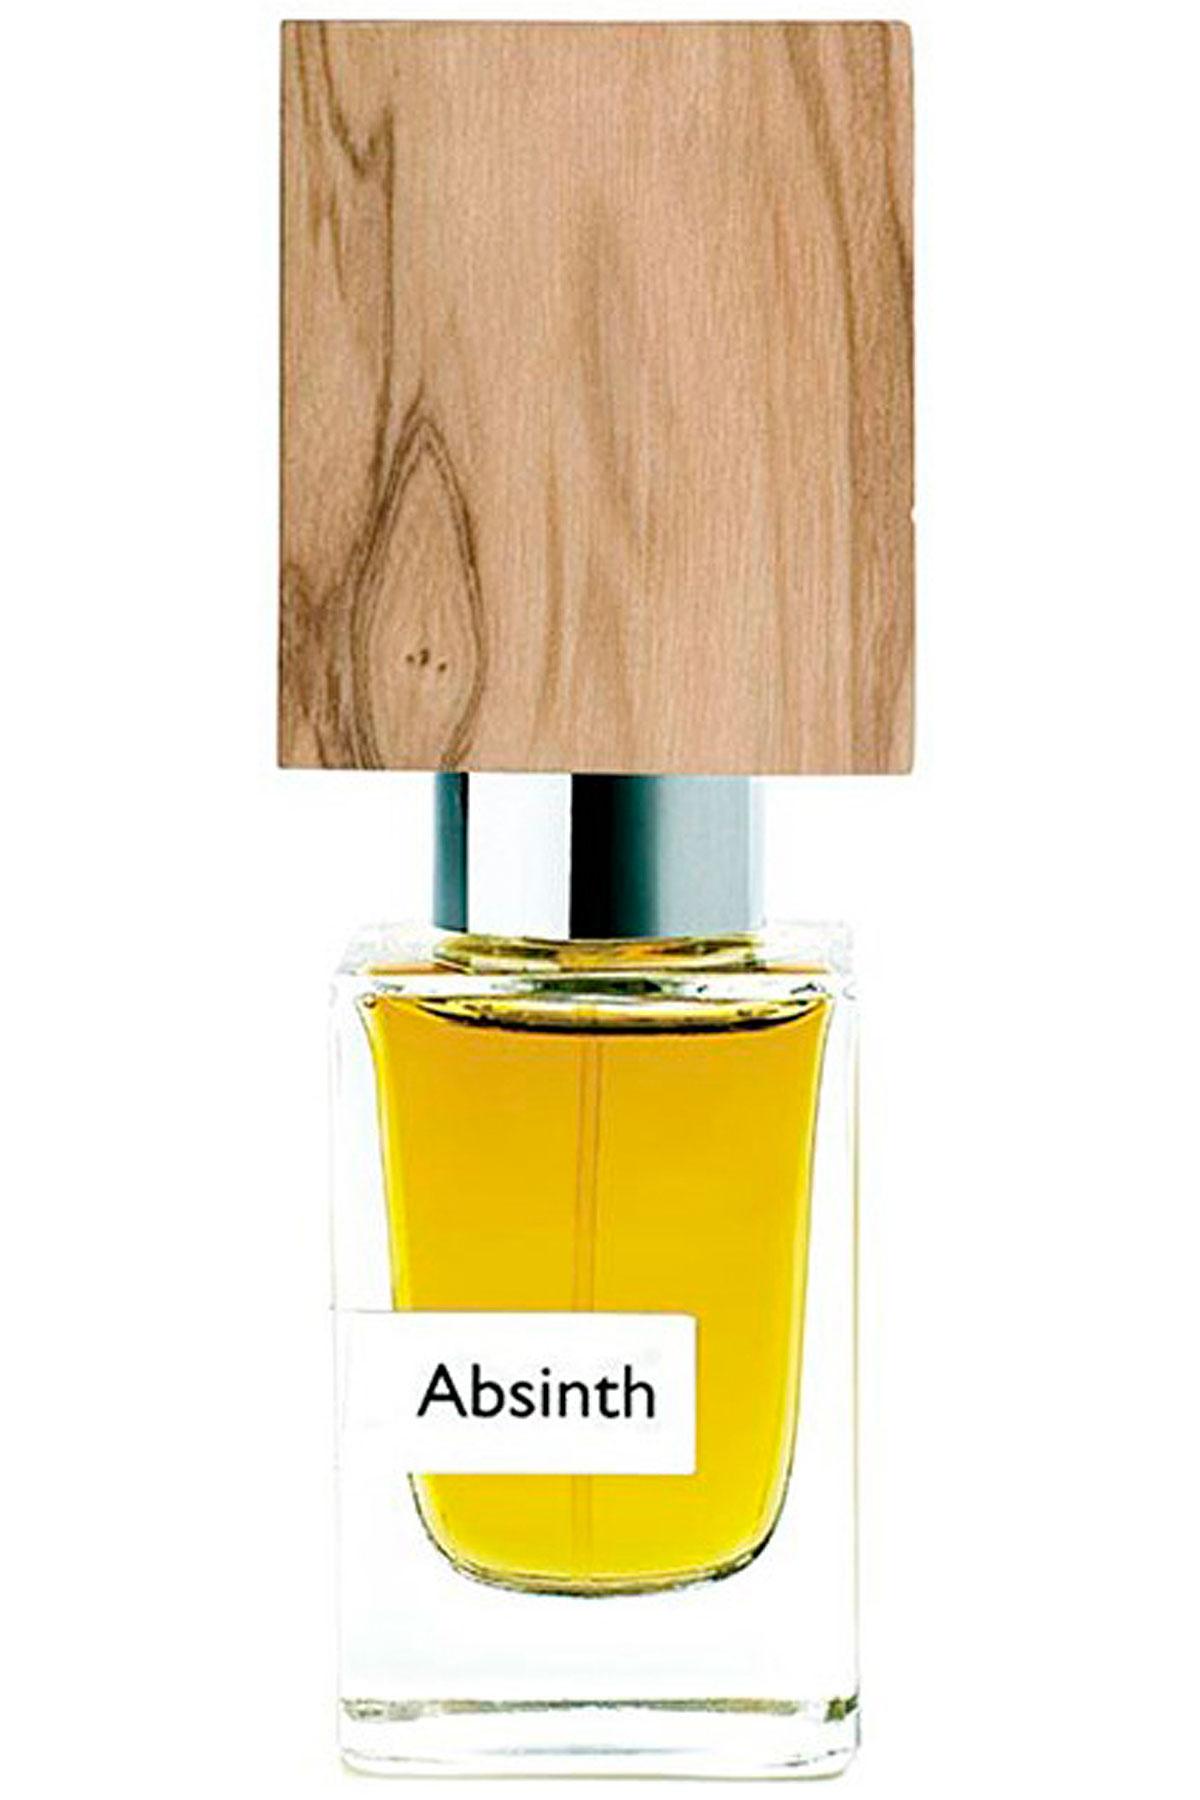 Nasomatto Fragrances for Men, Absinth - Extrait De Parfum - 30 Ml, 2019, 30 ml